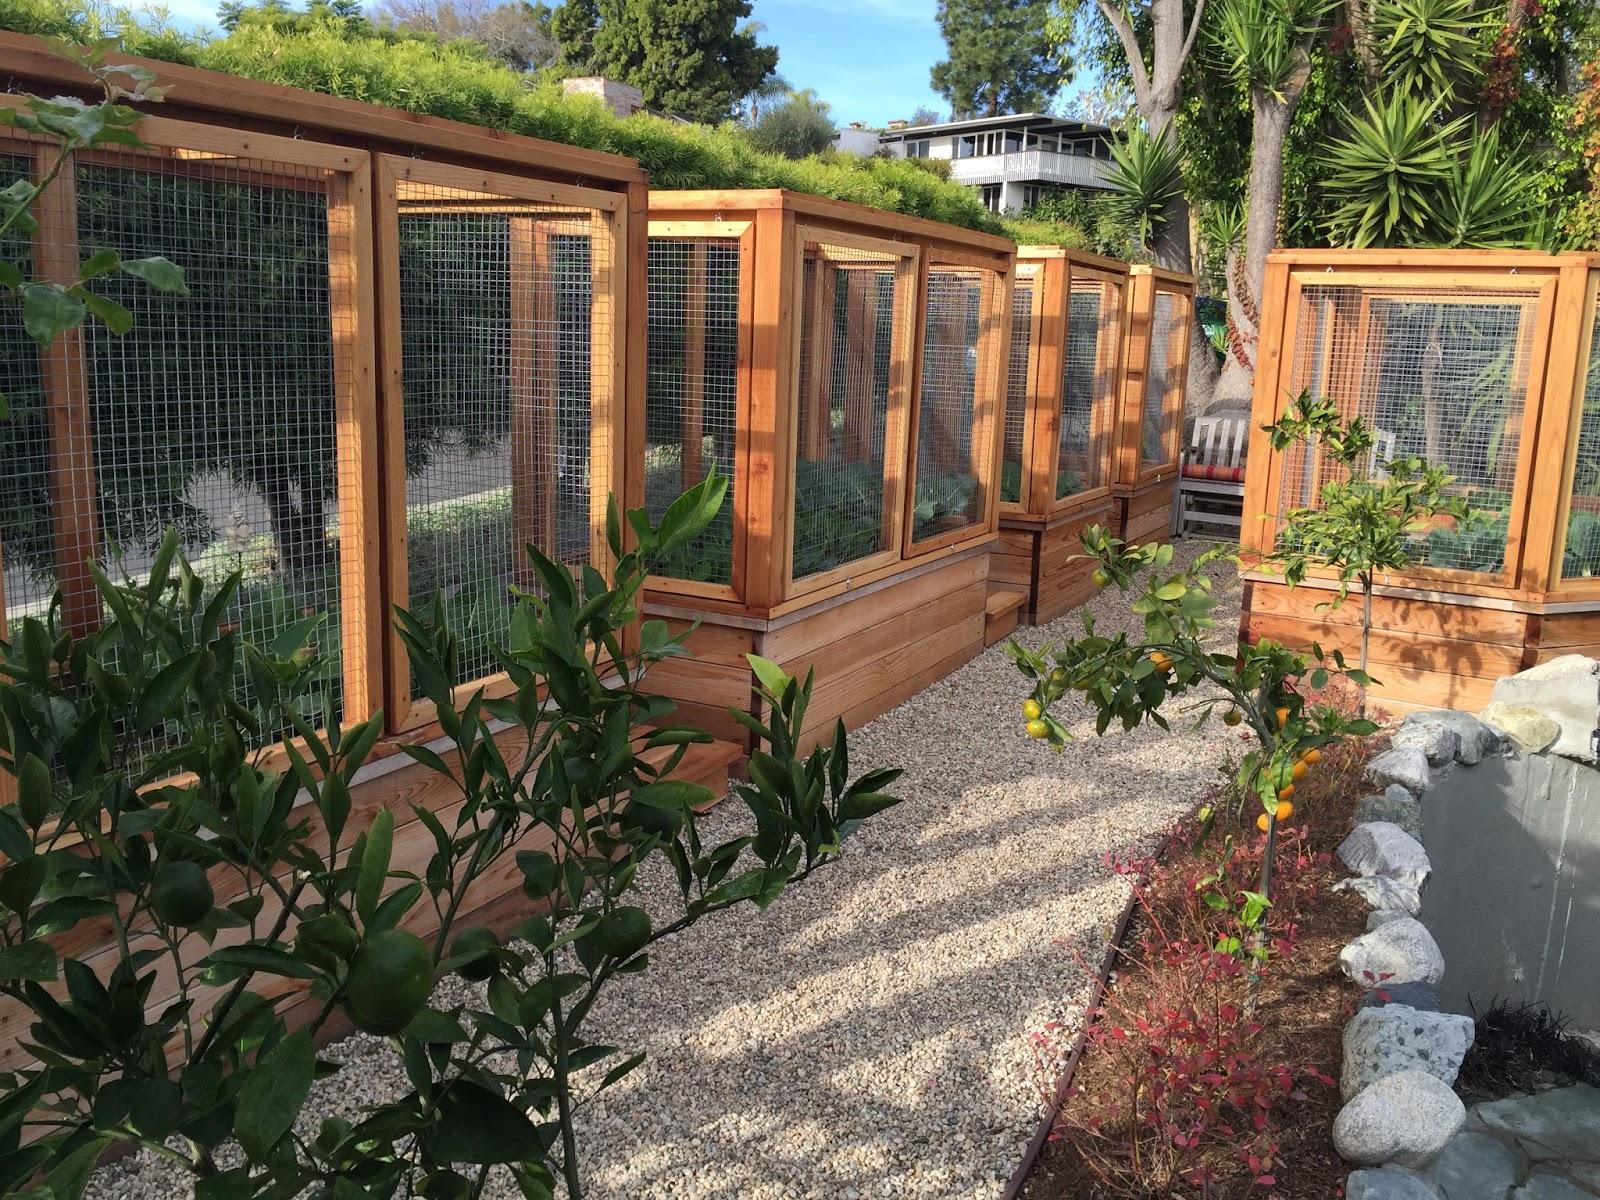 The Winter Garden, The Rain Barrel and Disneyland Dirt | Fresh From ...